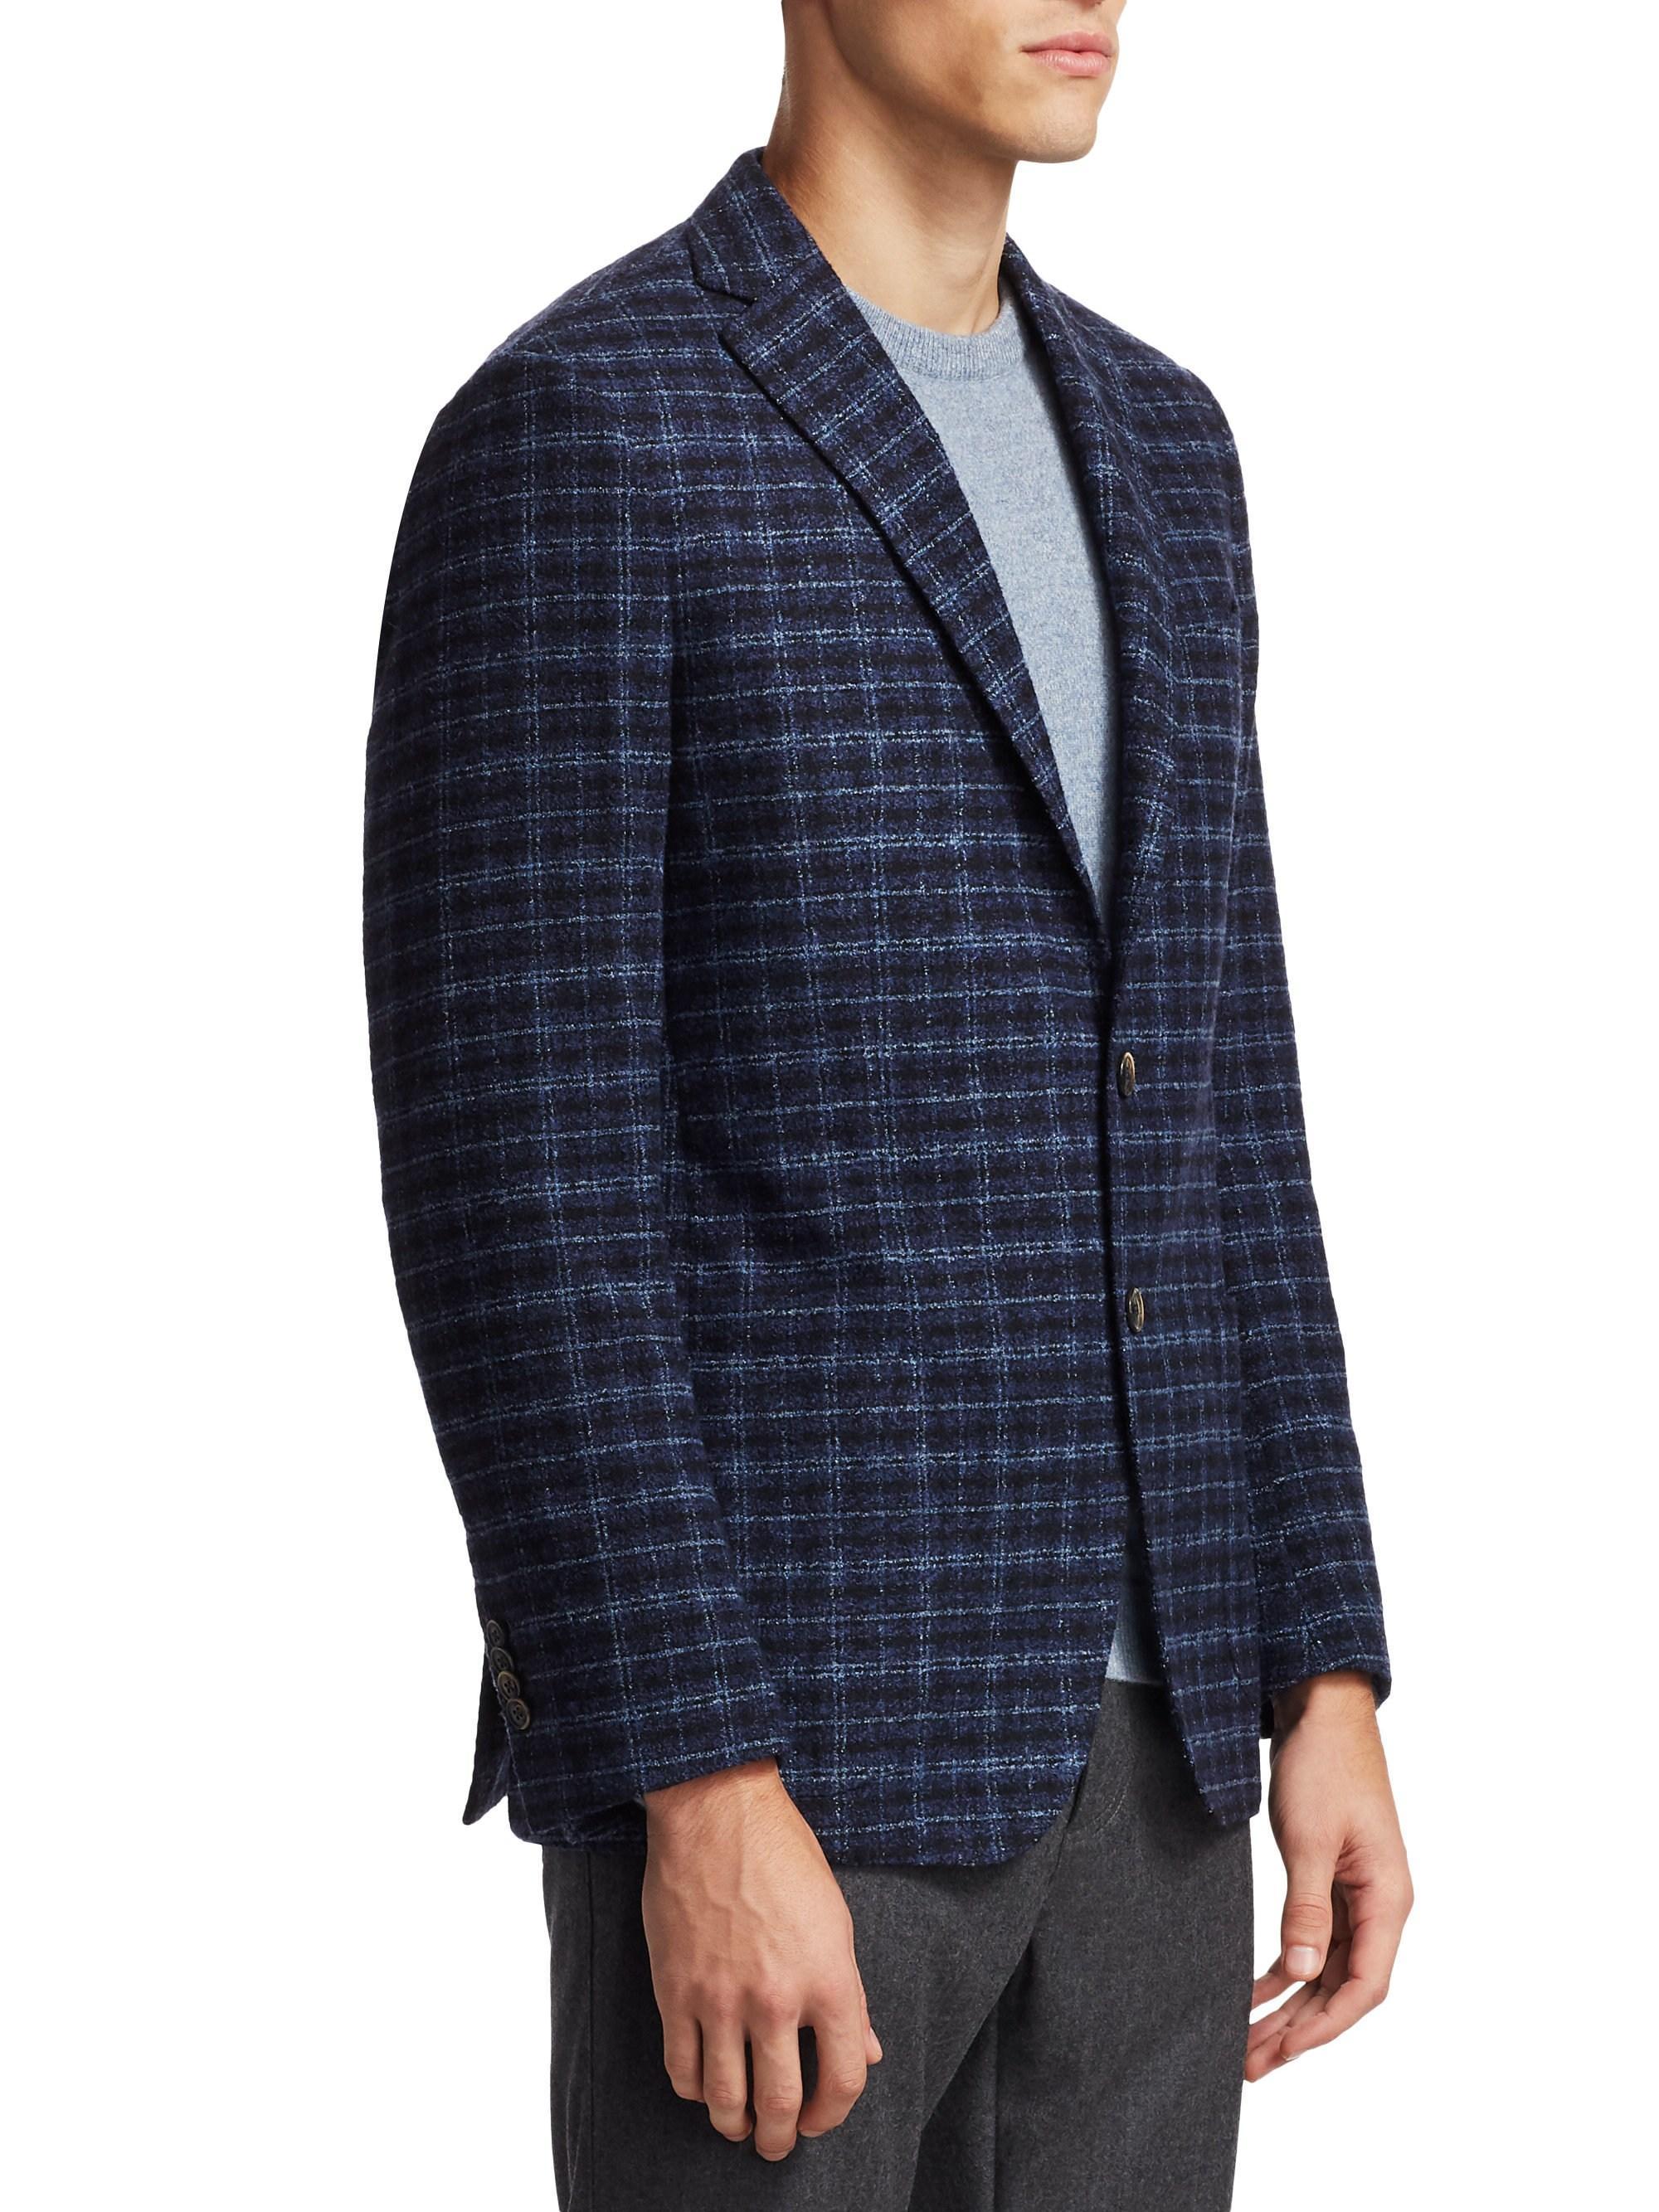 25b79971 Lyst - Saks Fifth Avenue Men's Collection Boucle Plaid Sportcoat ...